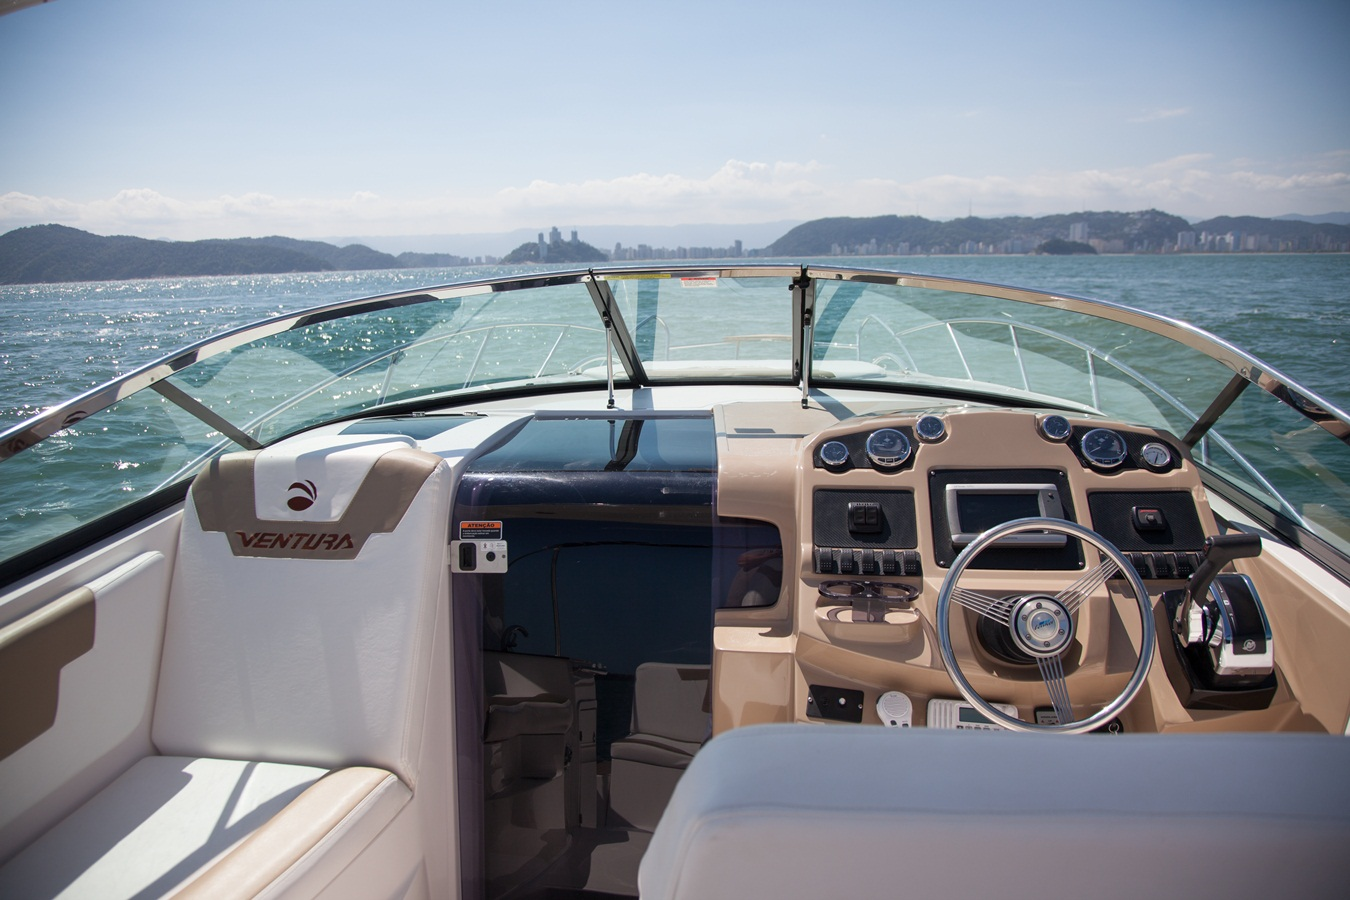 Ventura V350 Day Cruiser